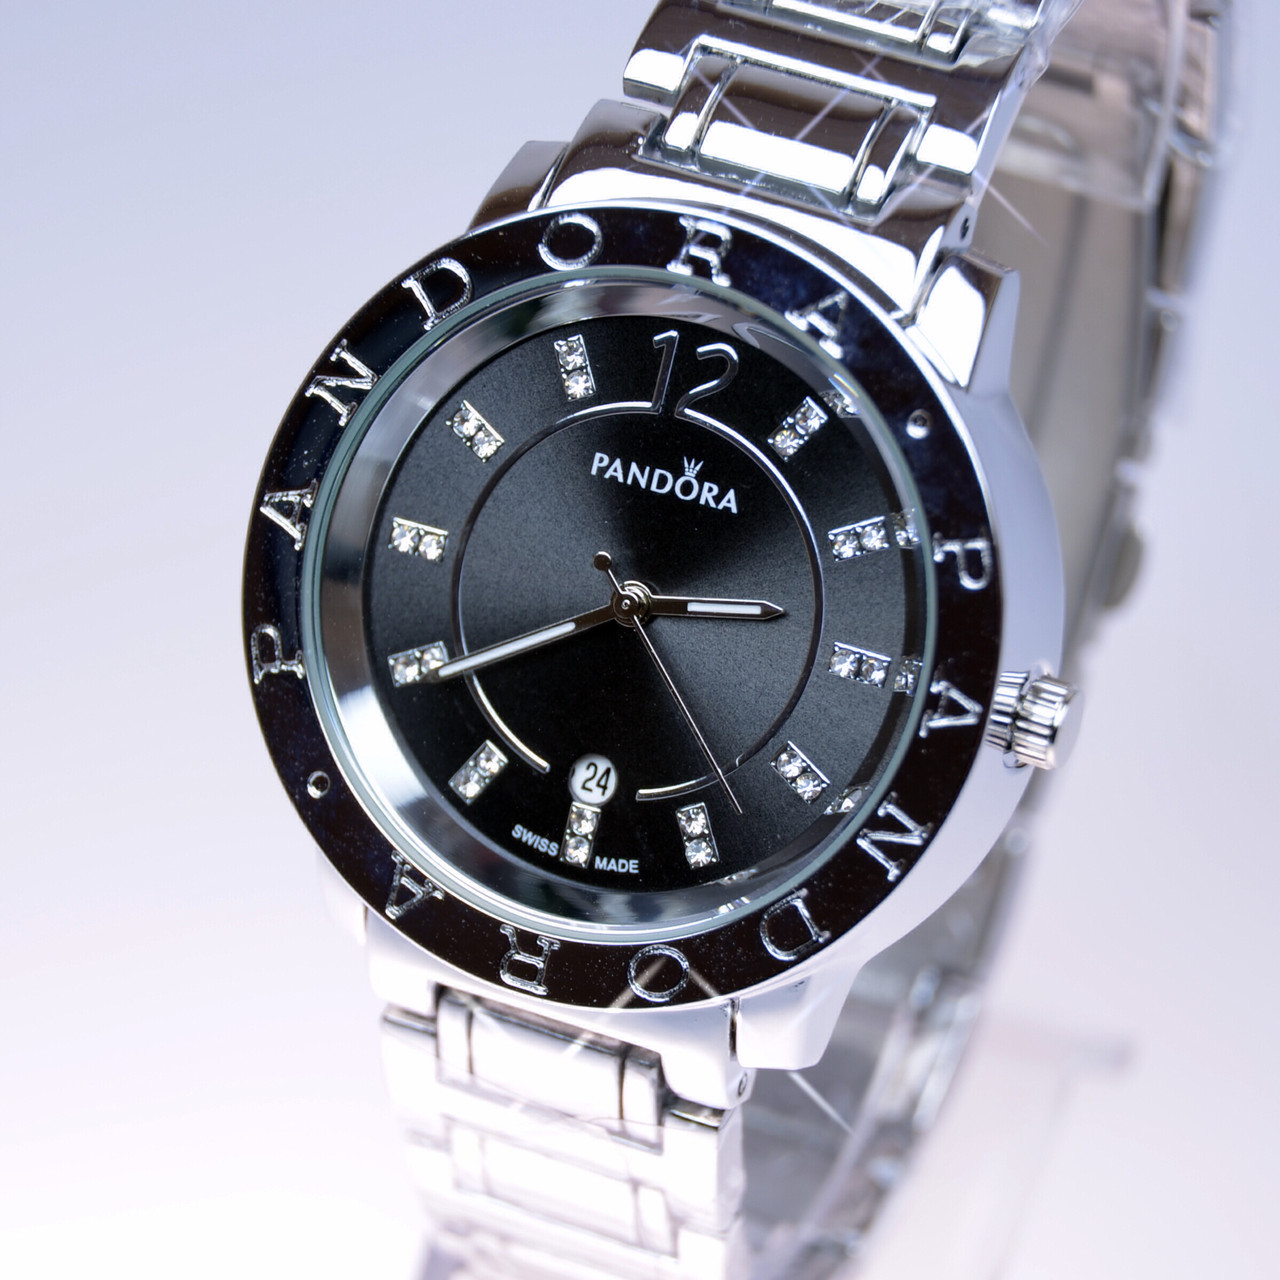 85e31787cc43 Женские наручные часы PANDORA (Пандора) B36 Silver календарь ...